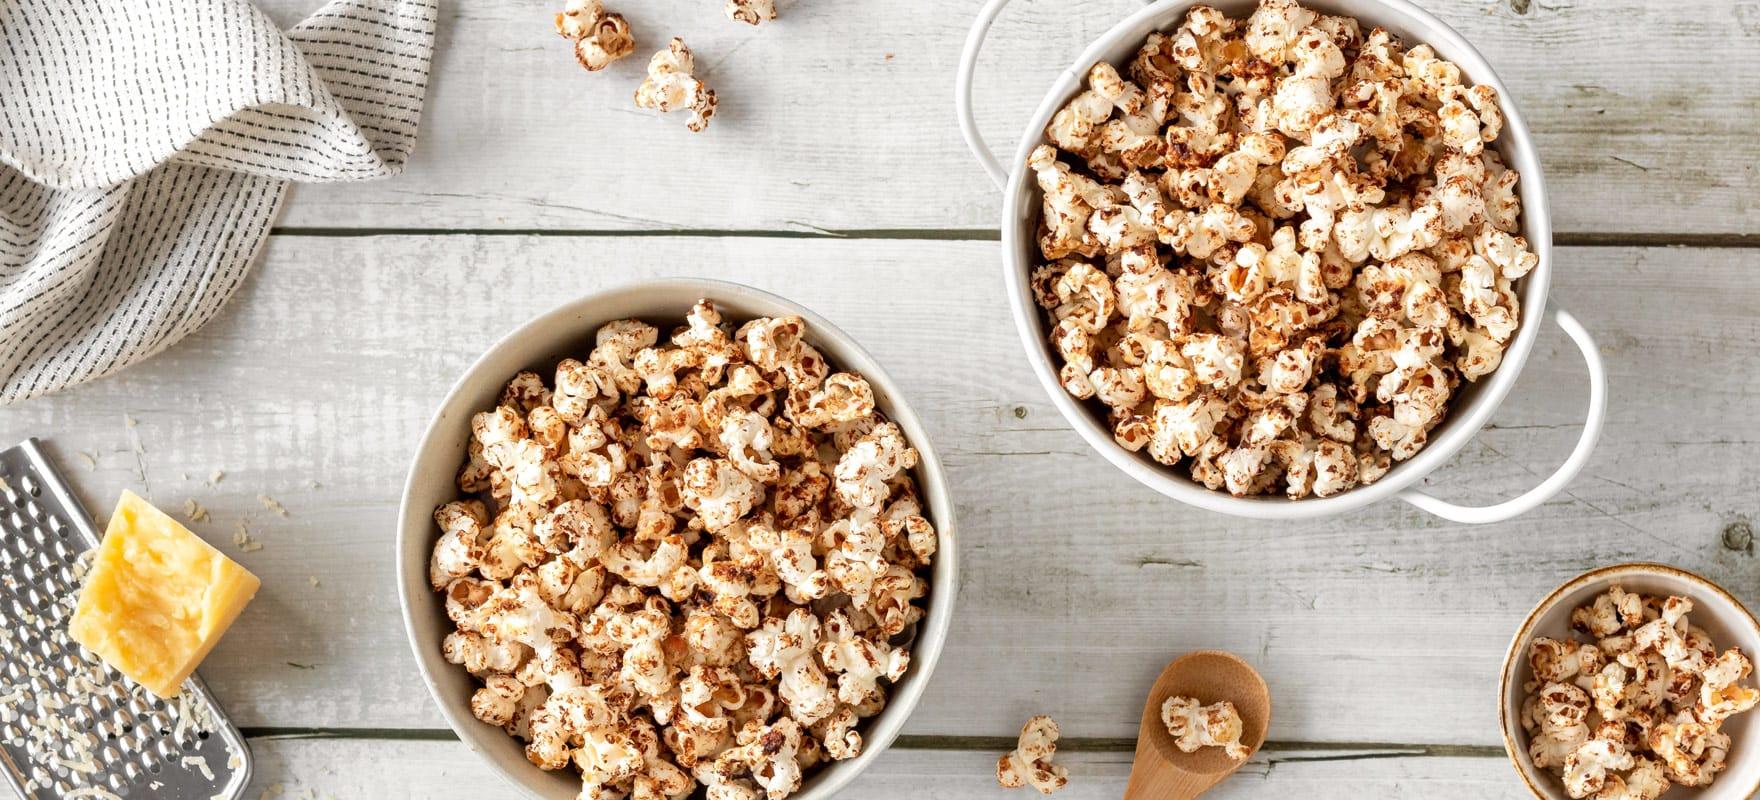 Marmite popcorn image 2